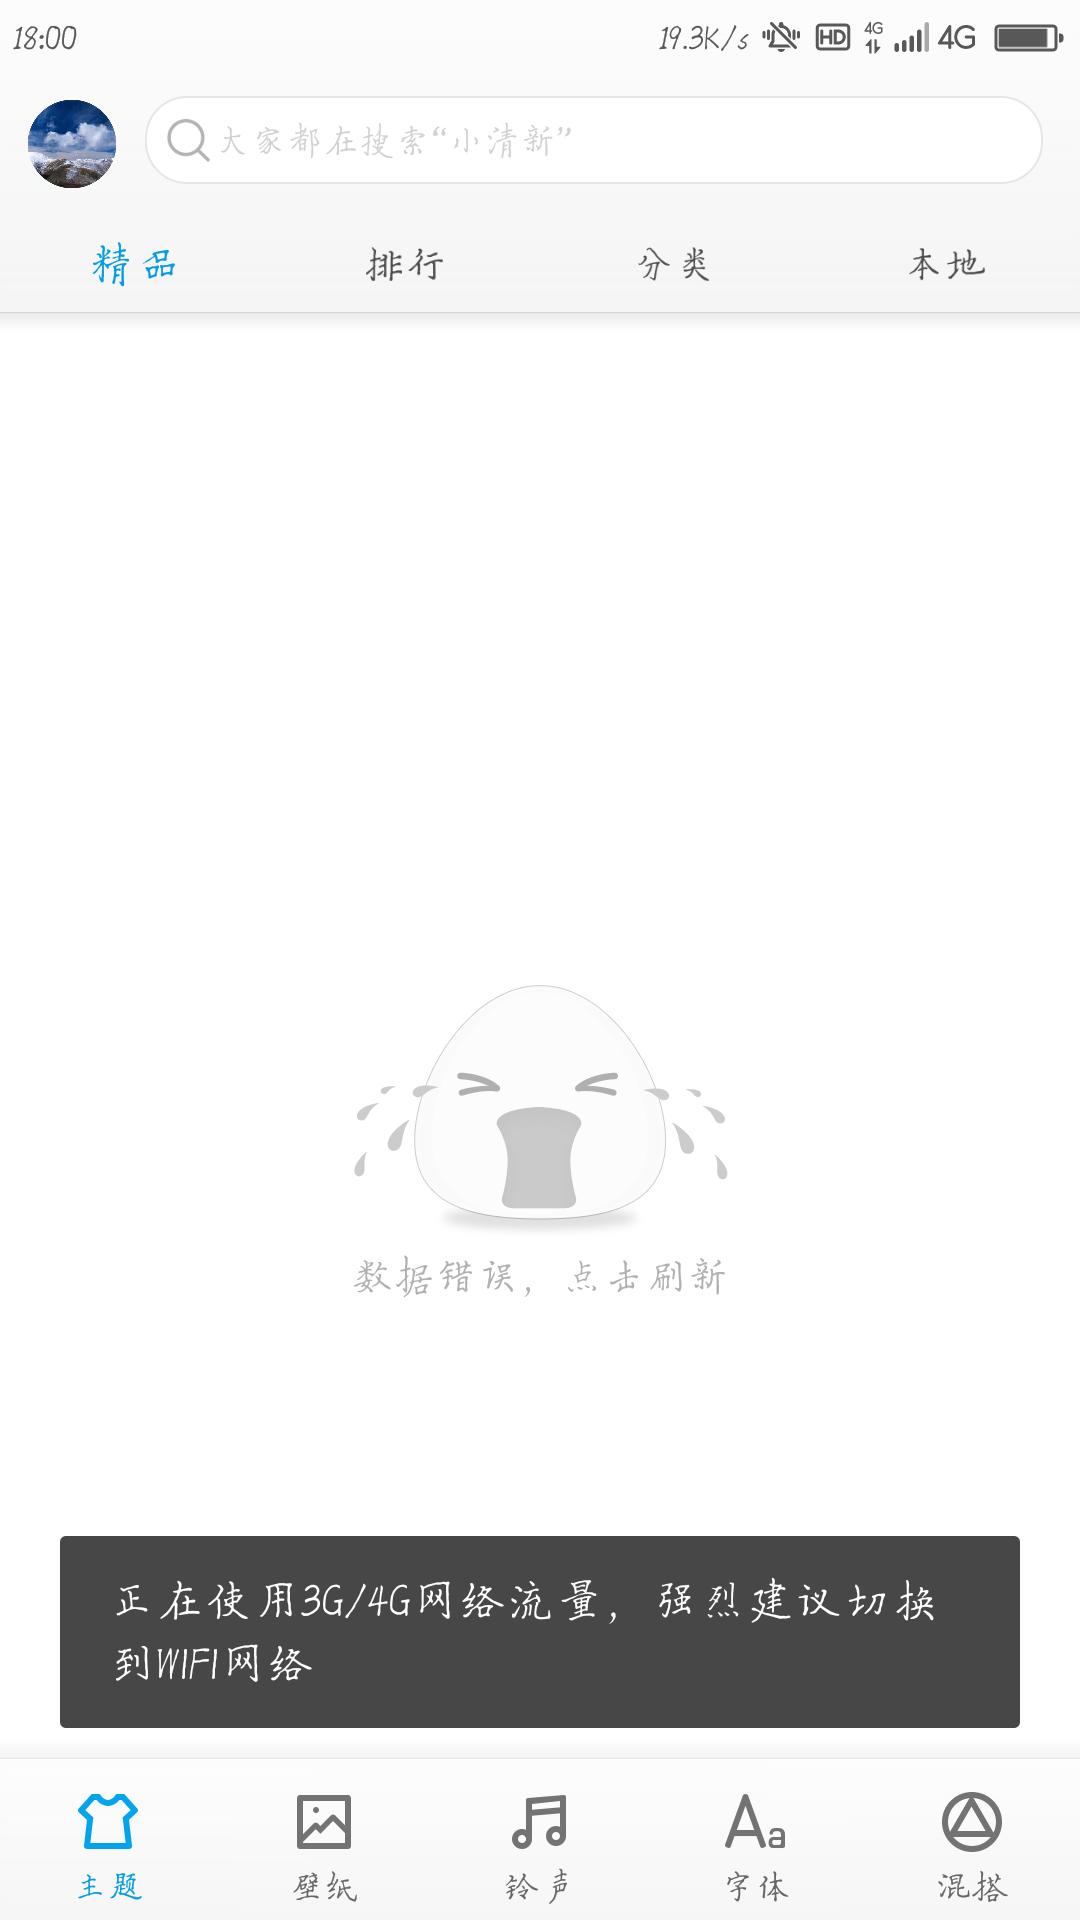 Screenshot_2017-02-25-18-00-22.png